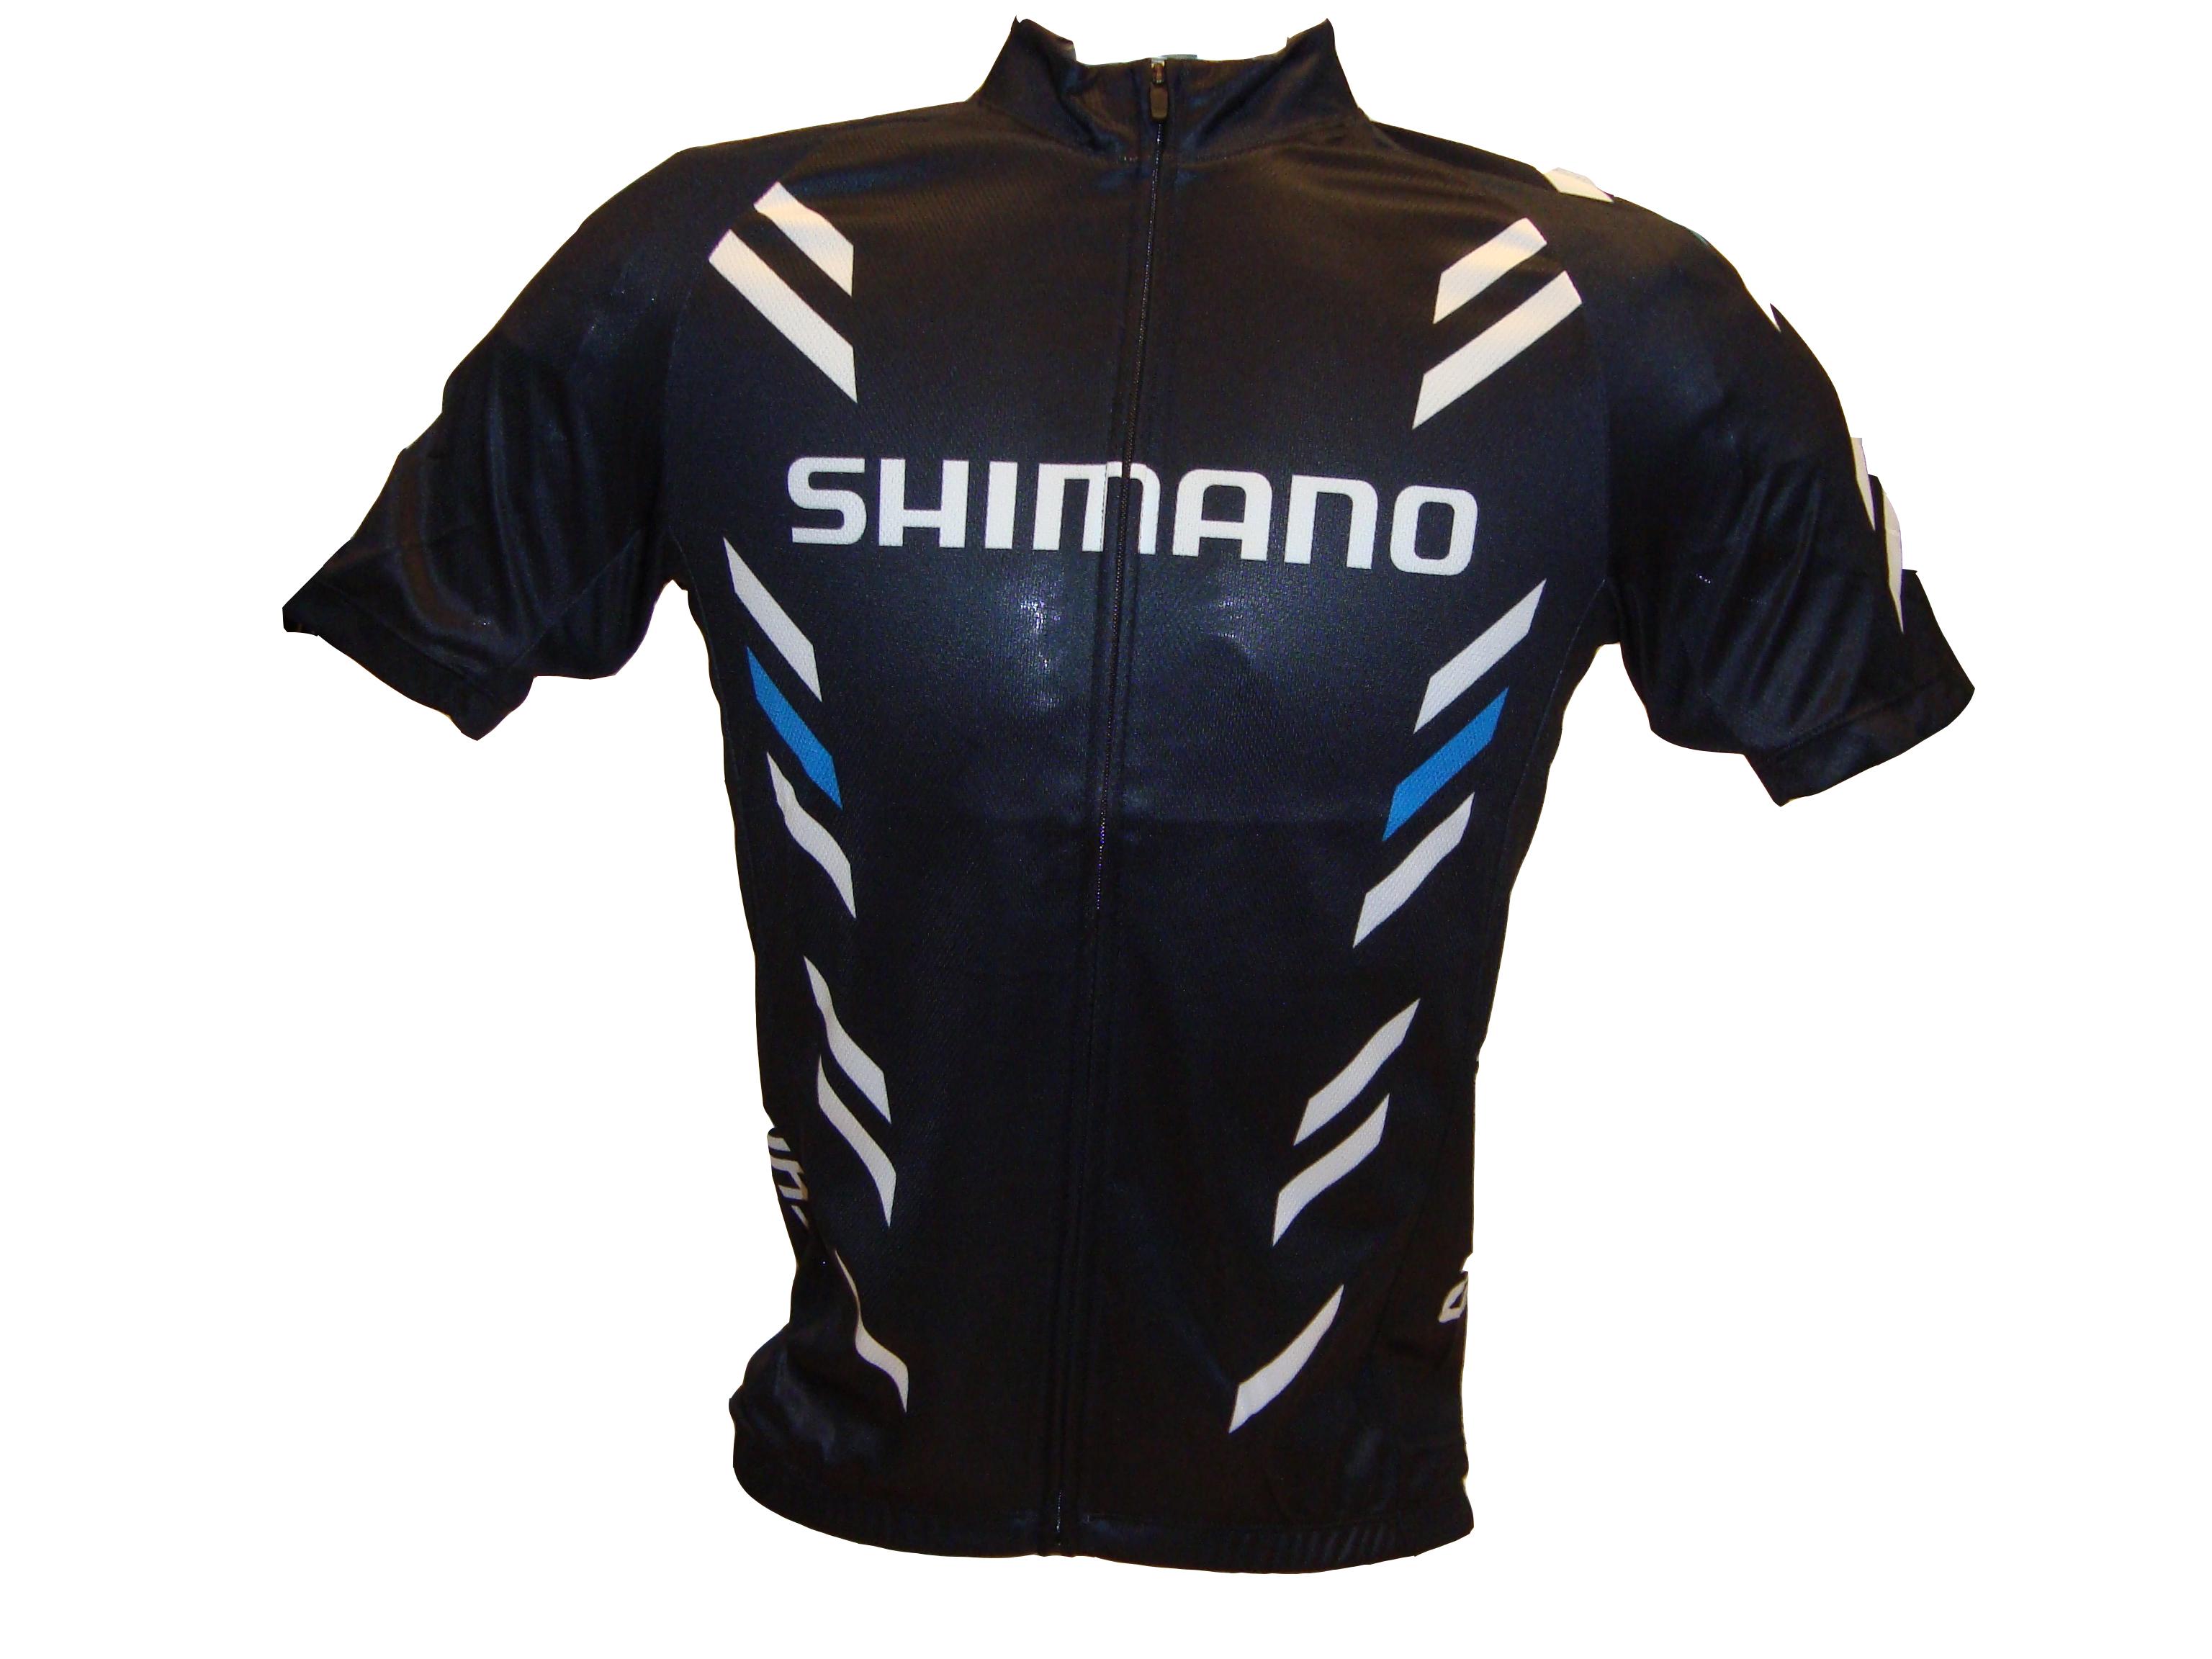 SHIMANO Print dres s krátkým rukávem, černá, S